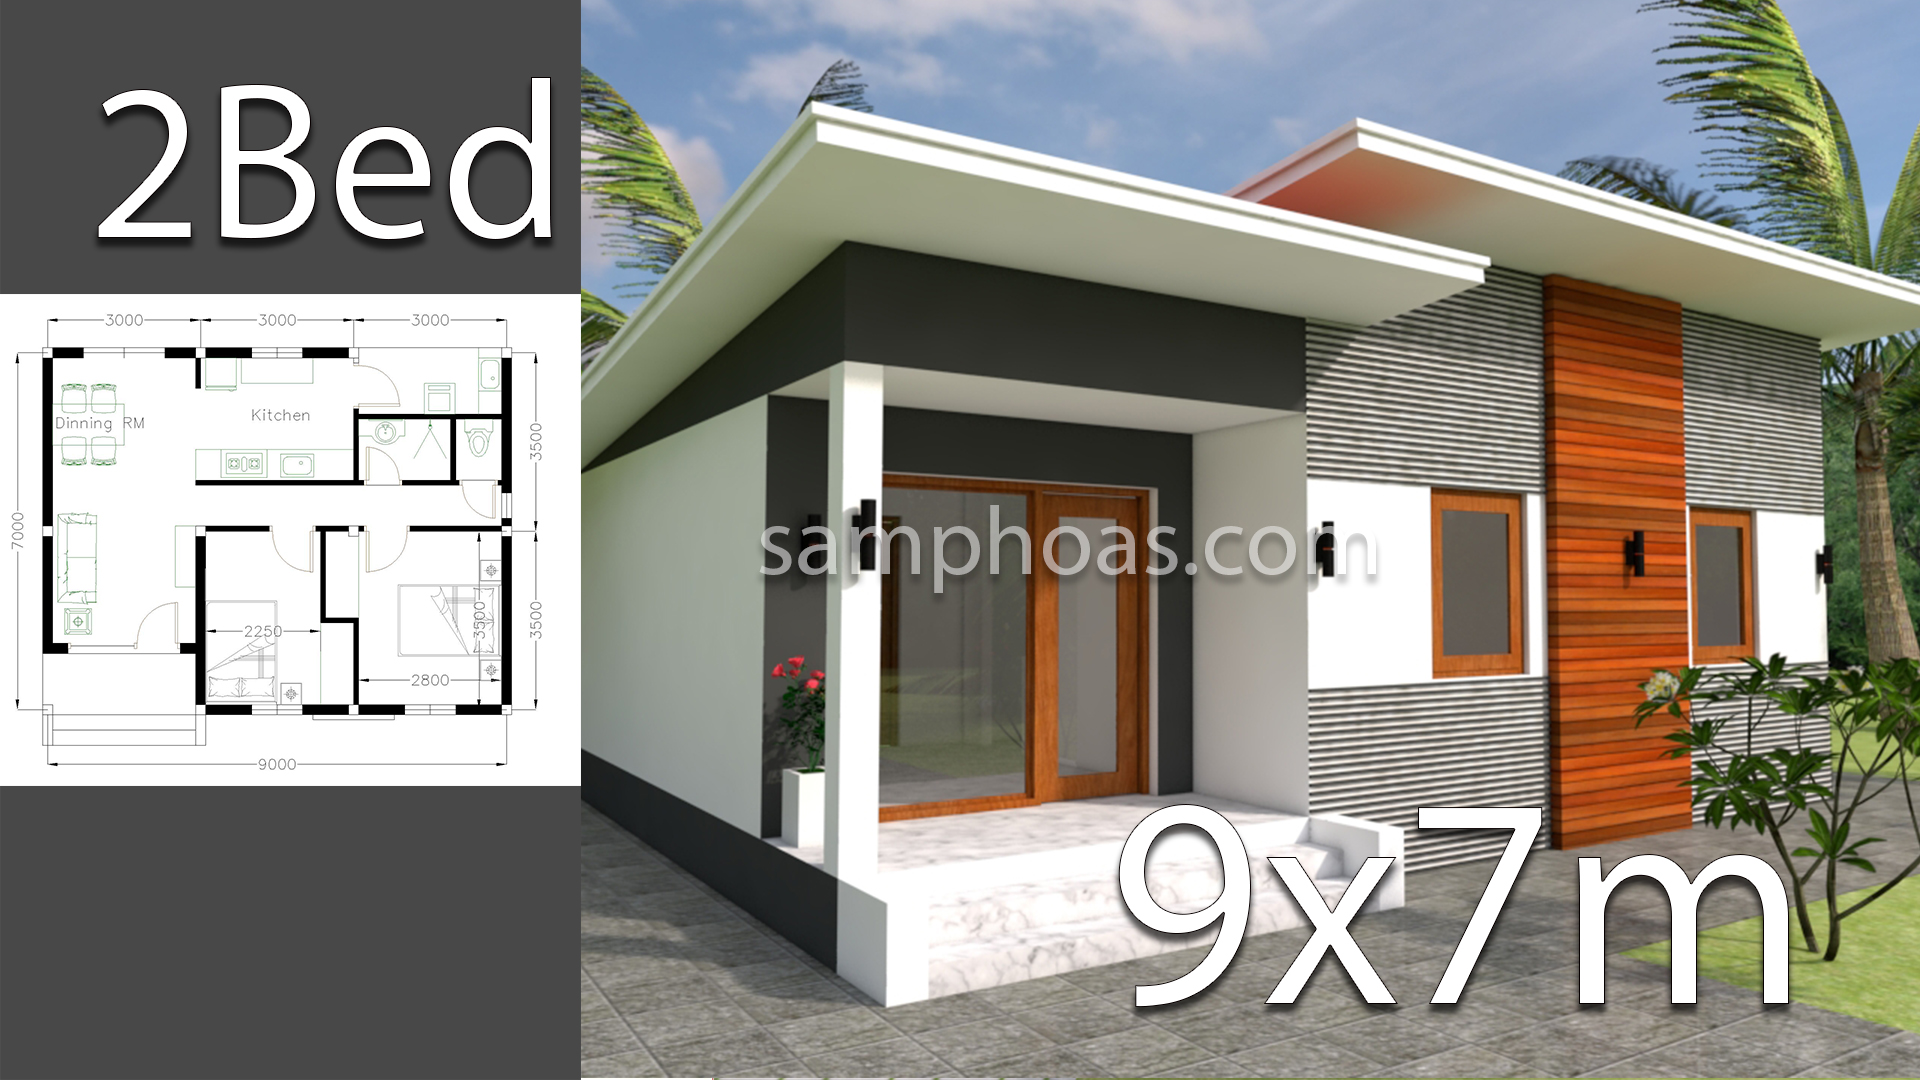 Plan 3d Home Design 9x7m 2 Bedrooms - SamPhoas Plan